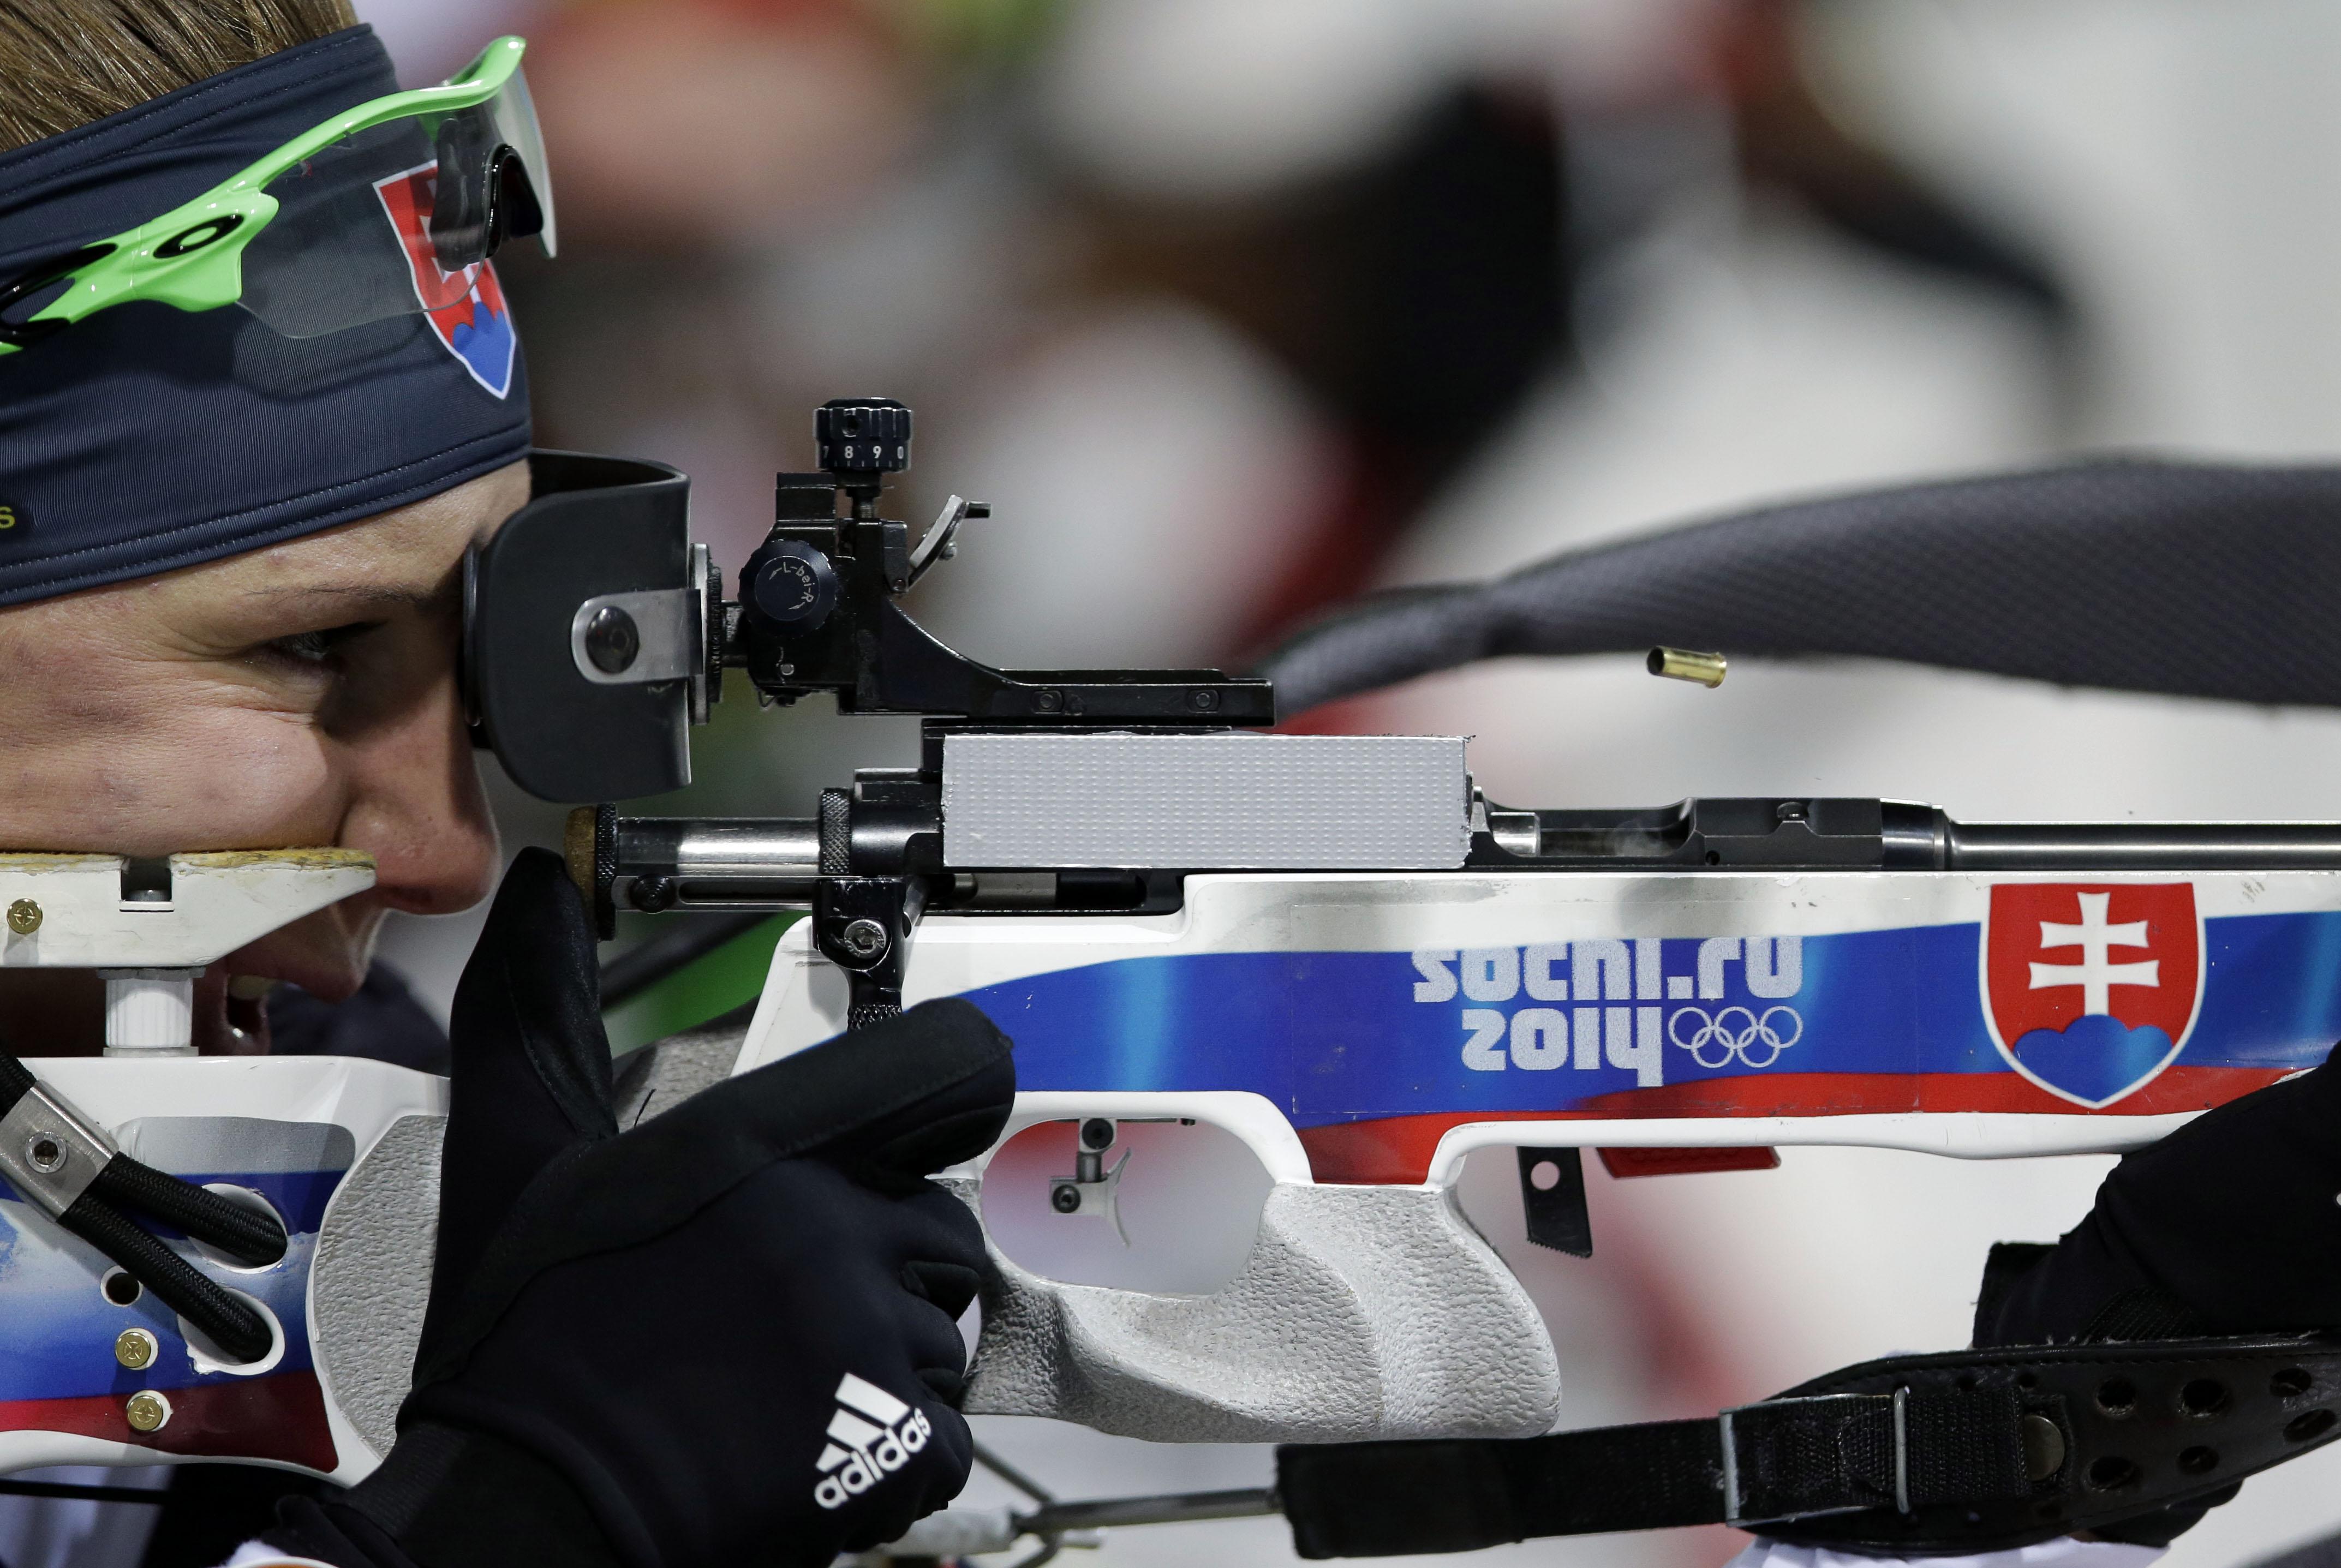 Slovakia's Anastasiya Kuzmina shoots during the women's biathlon 10k pursuit, at the 2014 Winter Olympics, Tuesday, Feb. 11, 2014, in Krasnaya Polyana, Russia. (AP Photo/Lee Jin-man)